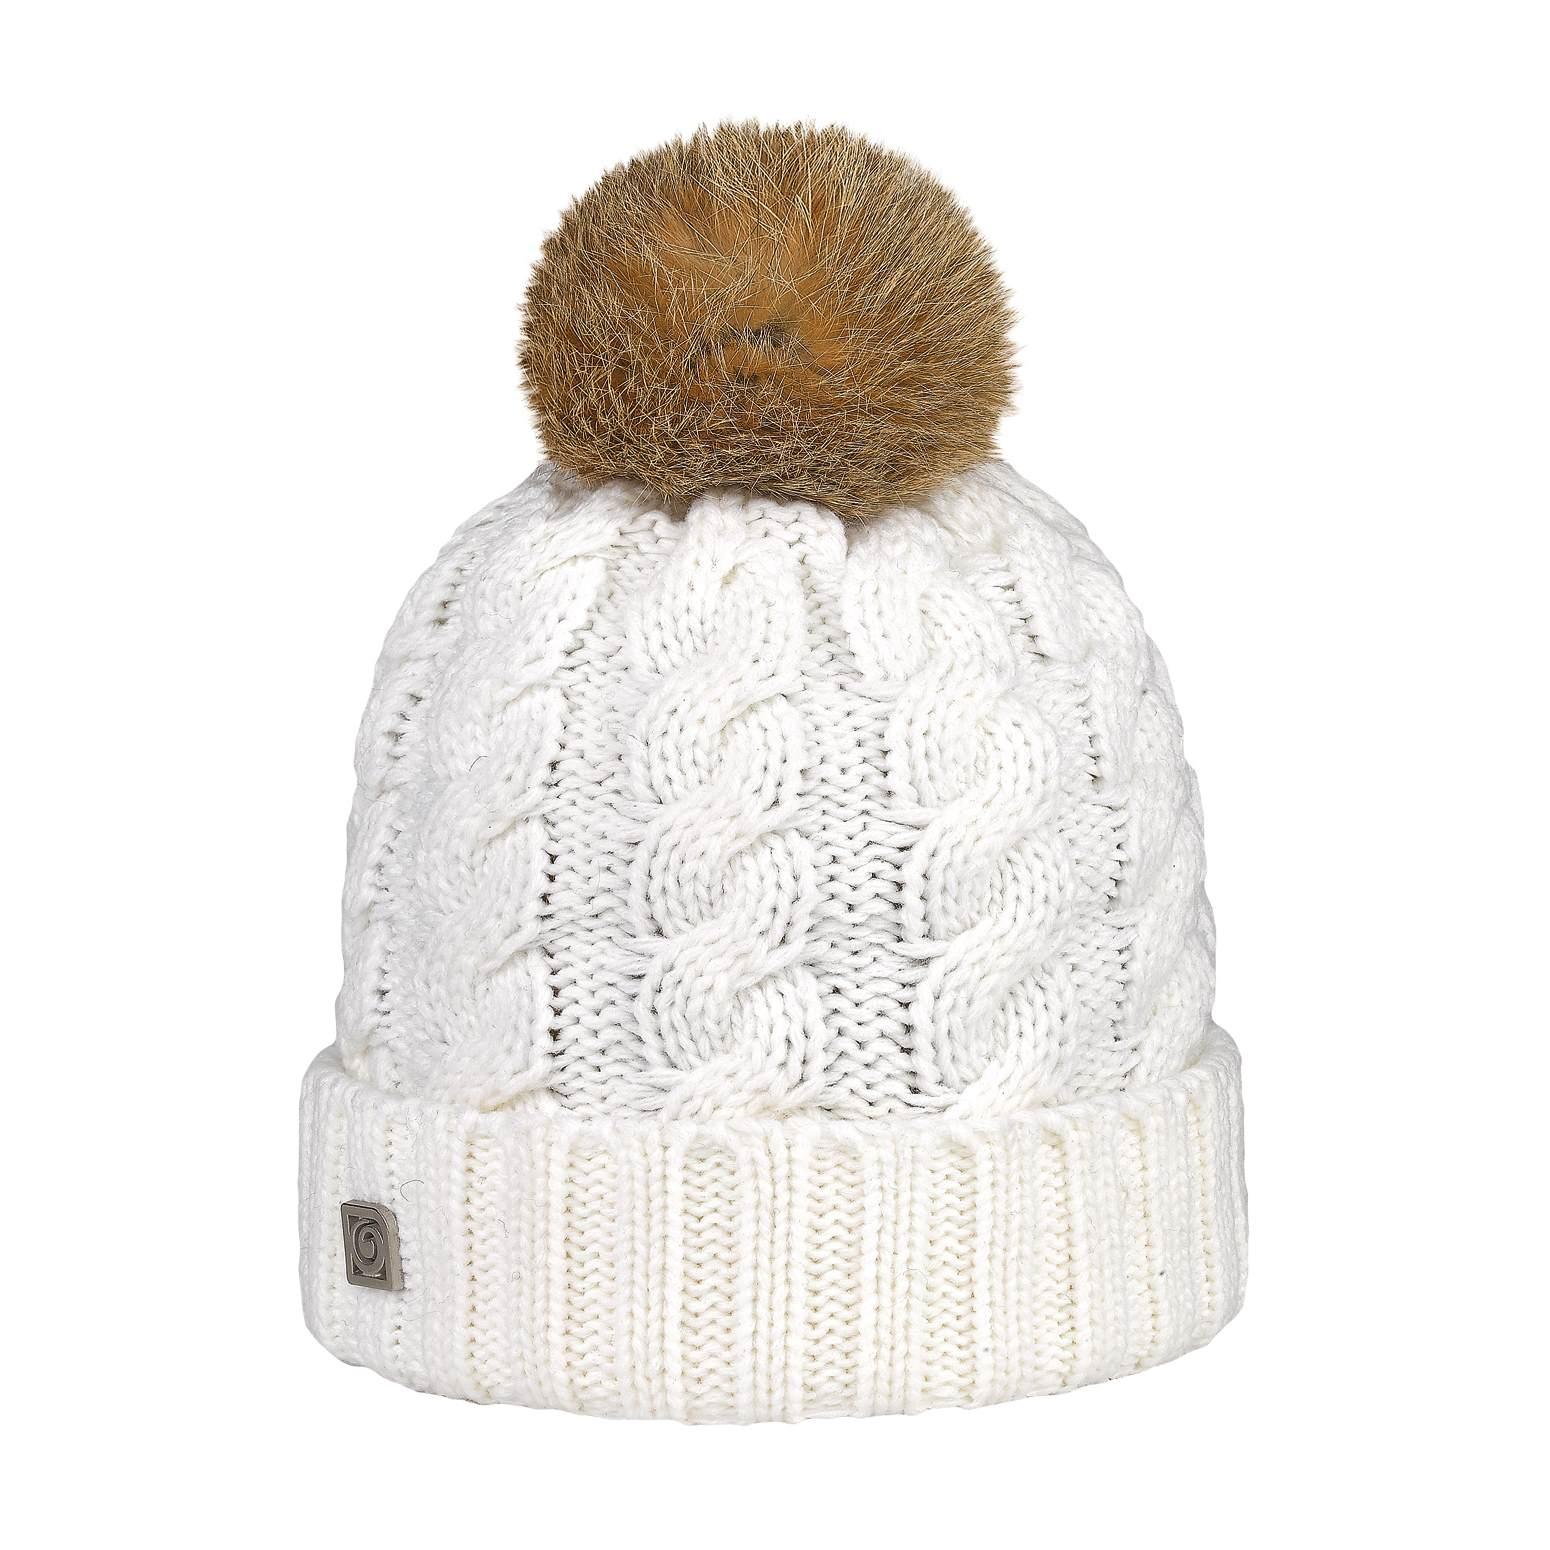 Cream Rabbit Pom Pom Hat 9d71b46752d